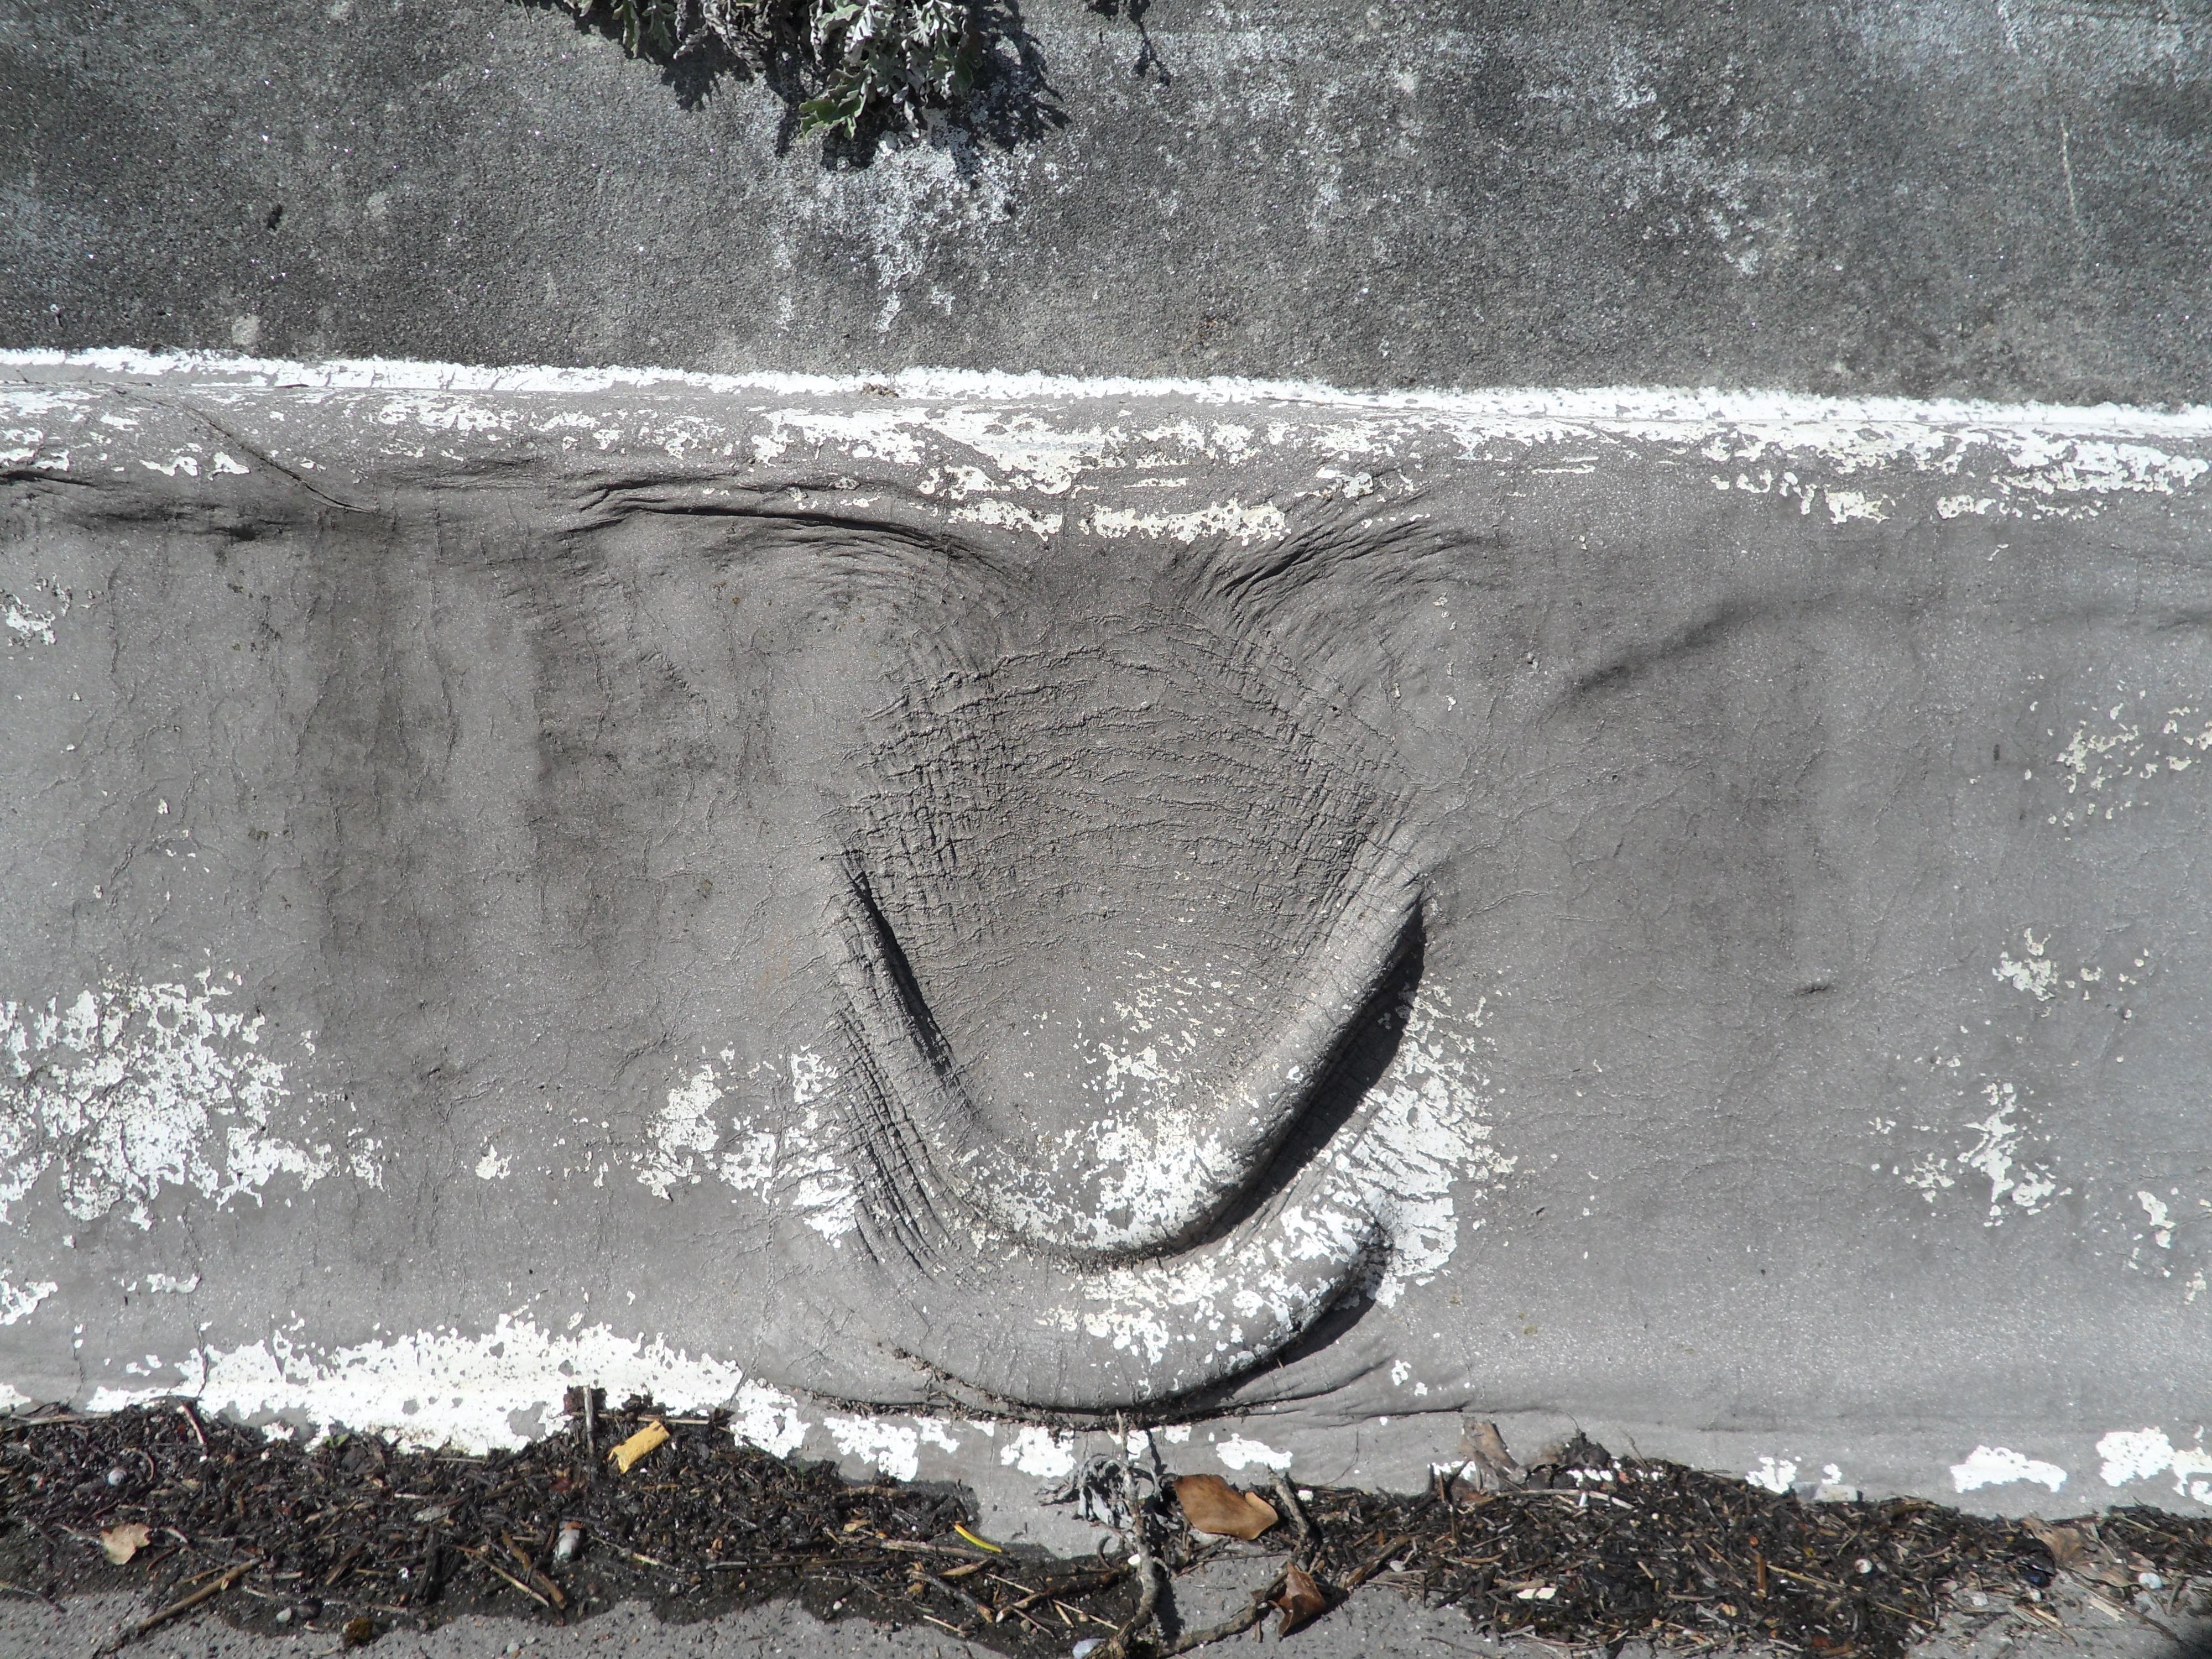 agua rock nieve invierno estructura textura pared piedra asfalto hielo exterior material hormign superficie texturizado